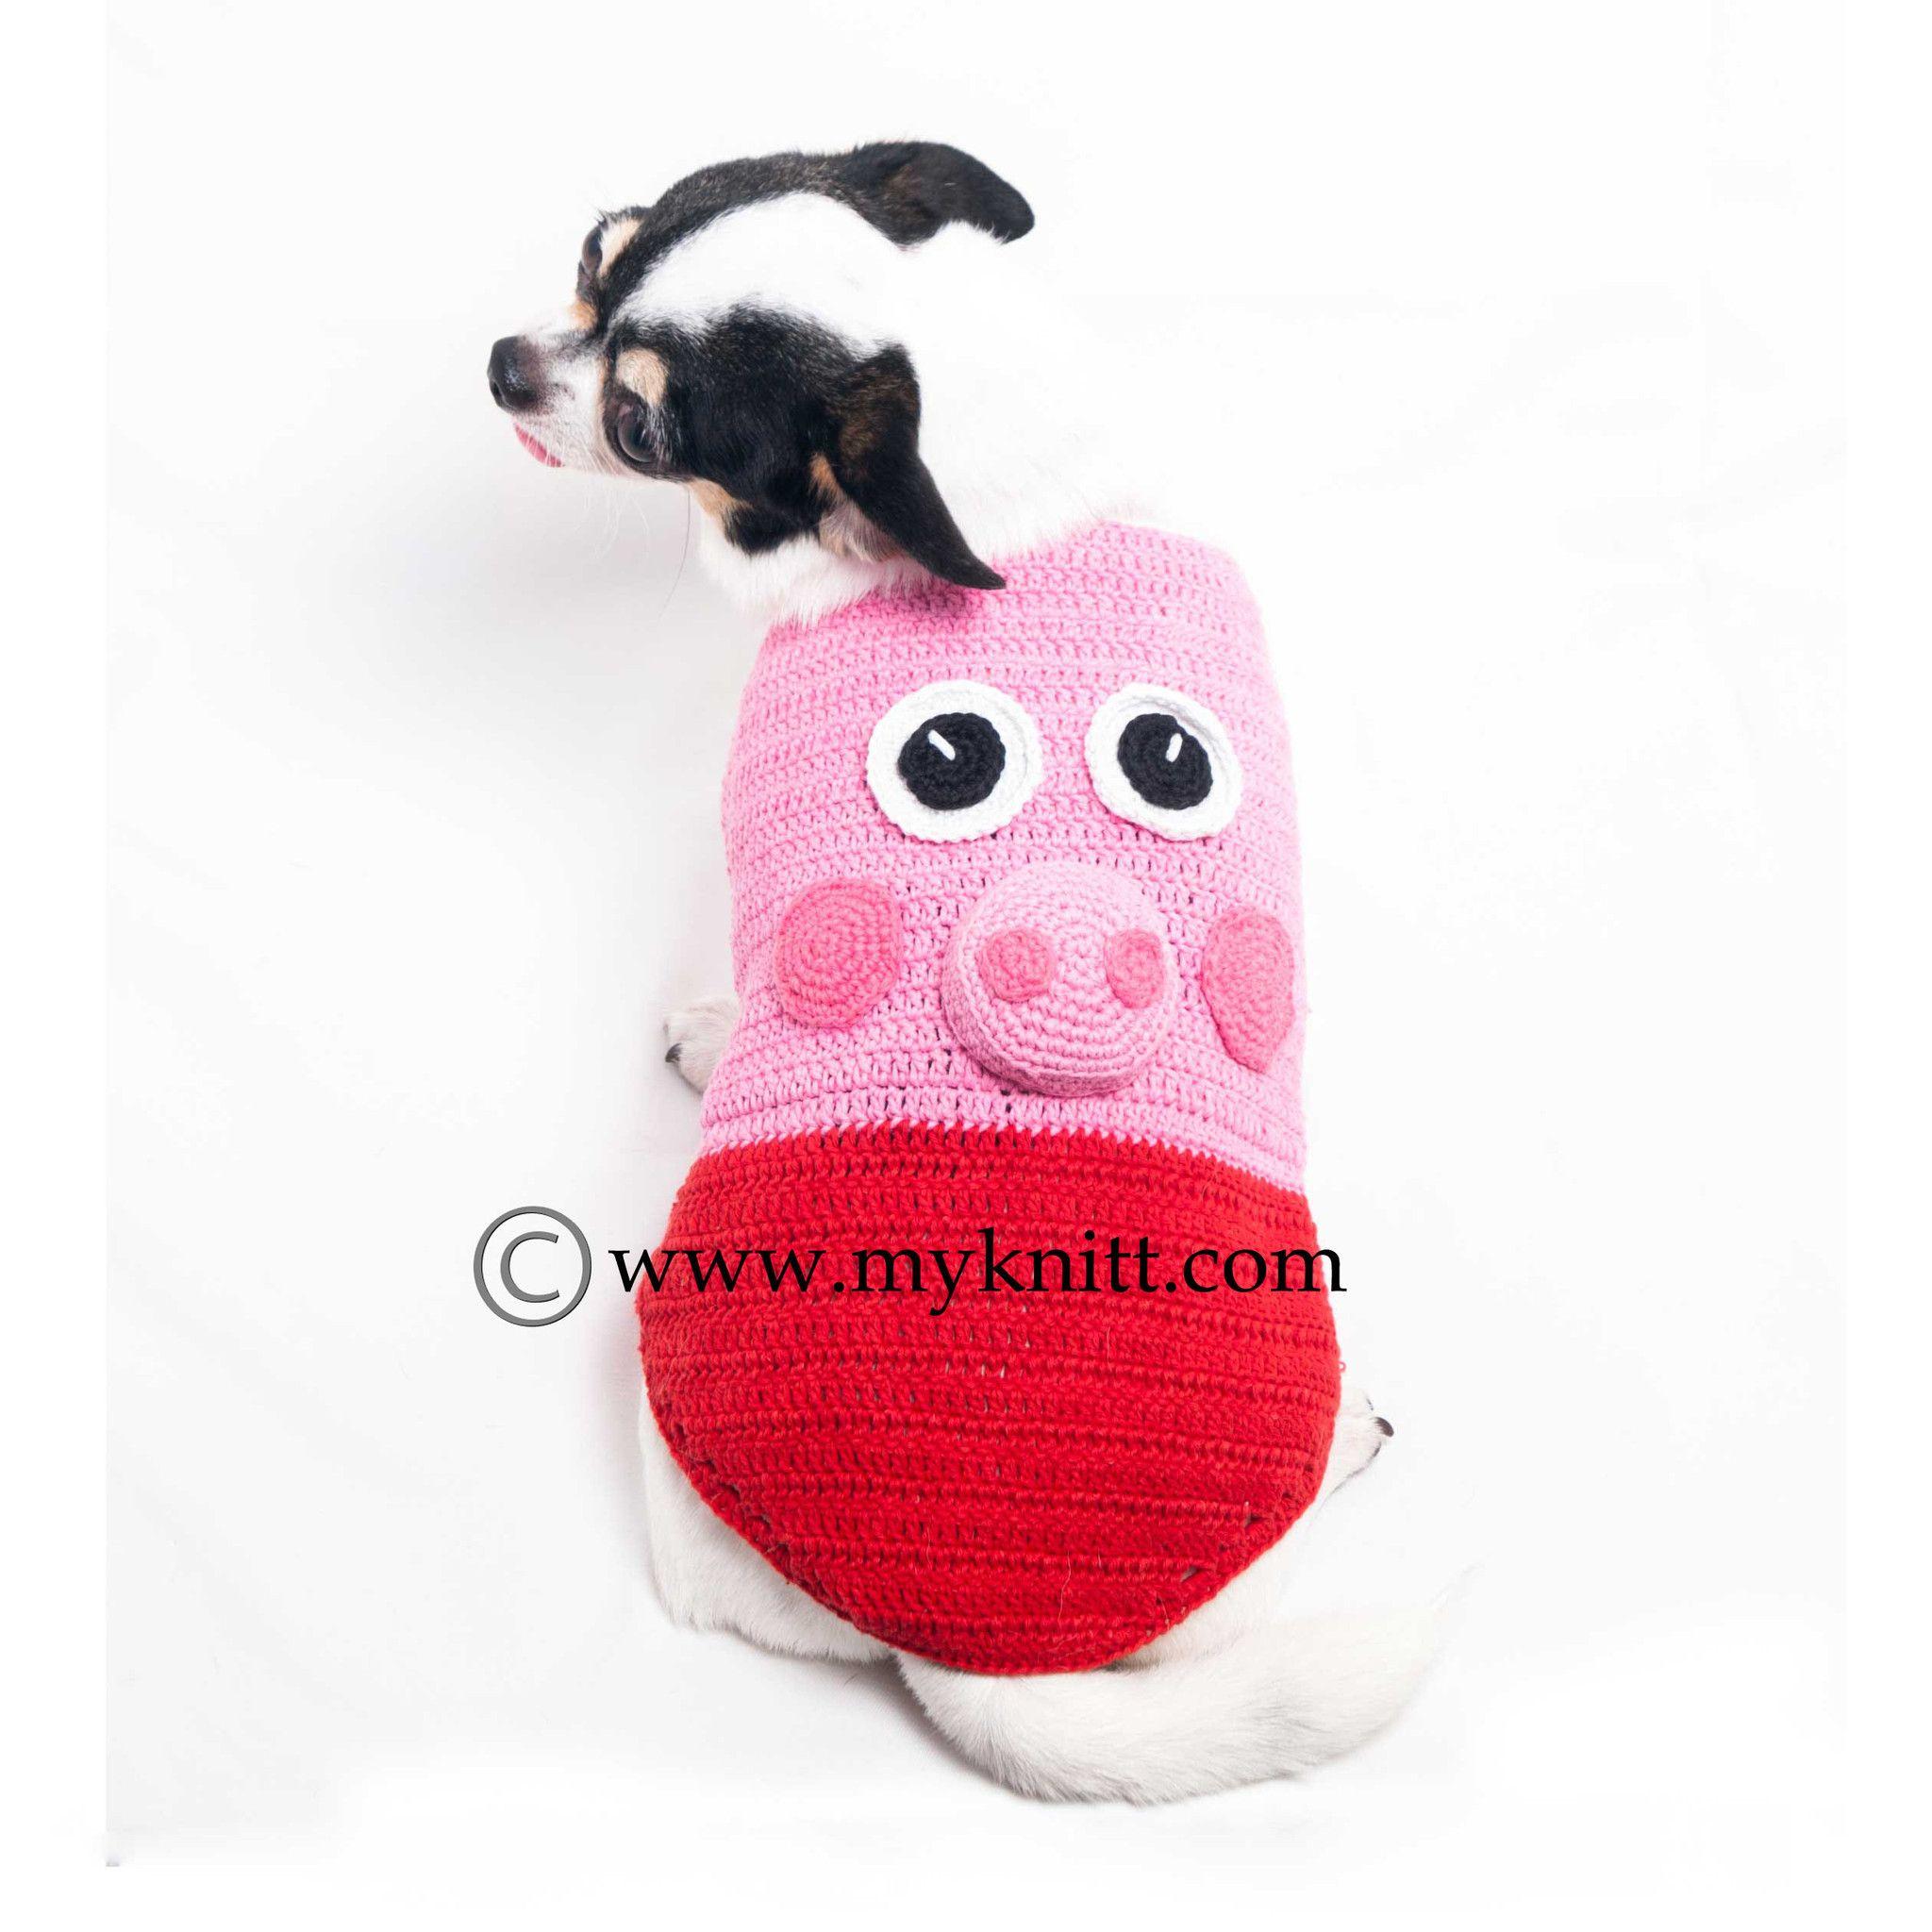 Peppa Pig Dog Costumes Unique Handmade Crochet Dk998 Dog